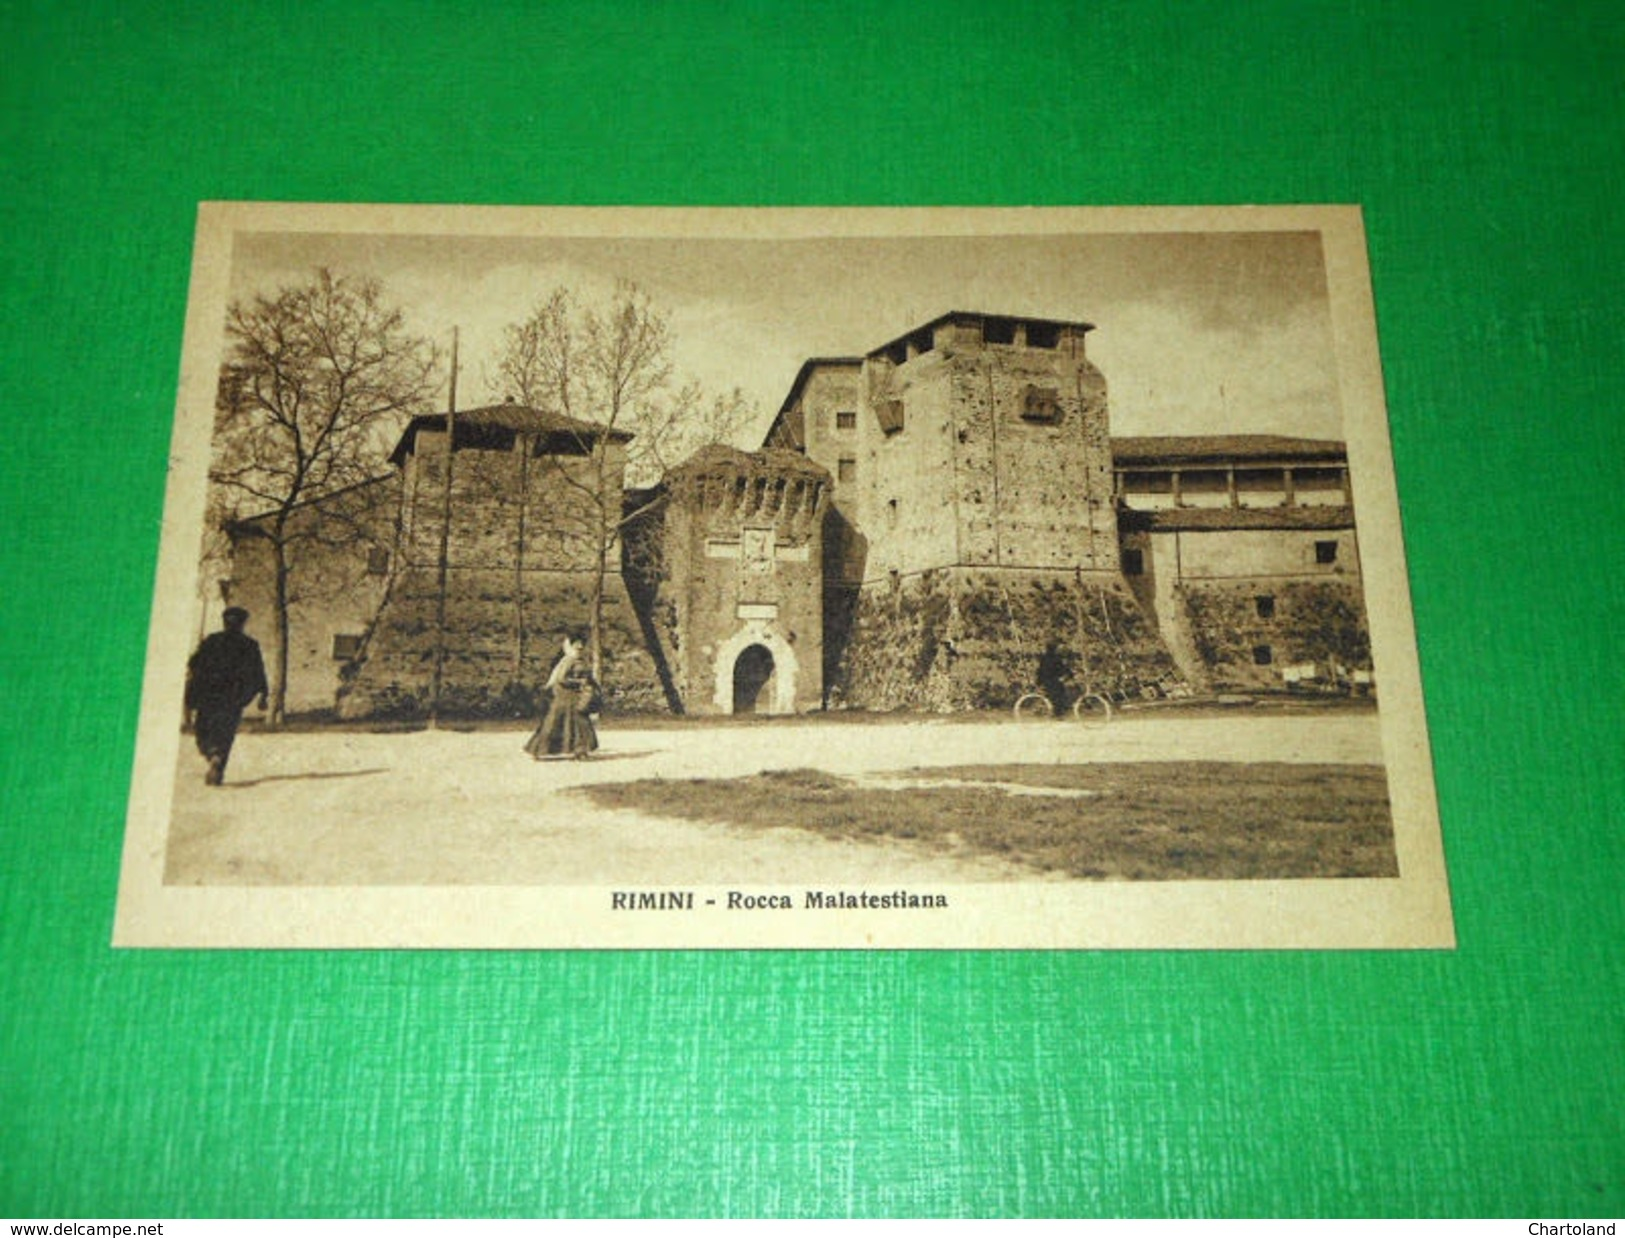 Cartolina Rimini - Racca Malatestiana 1925 Ca - Rimini